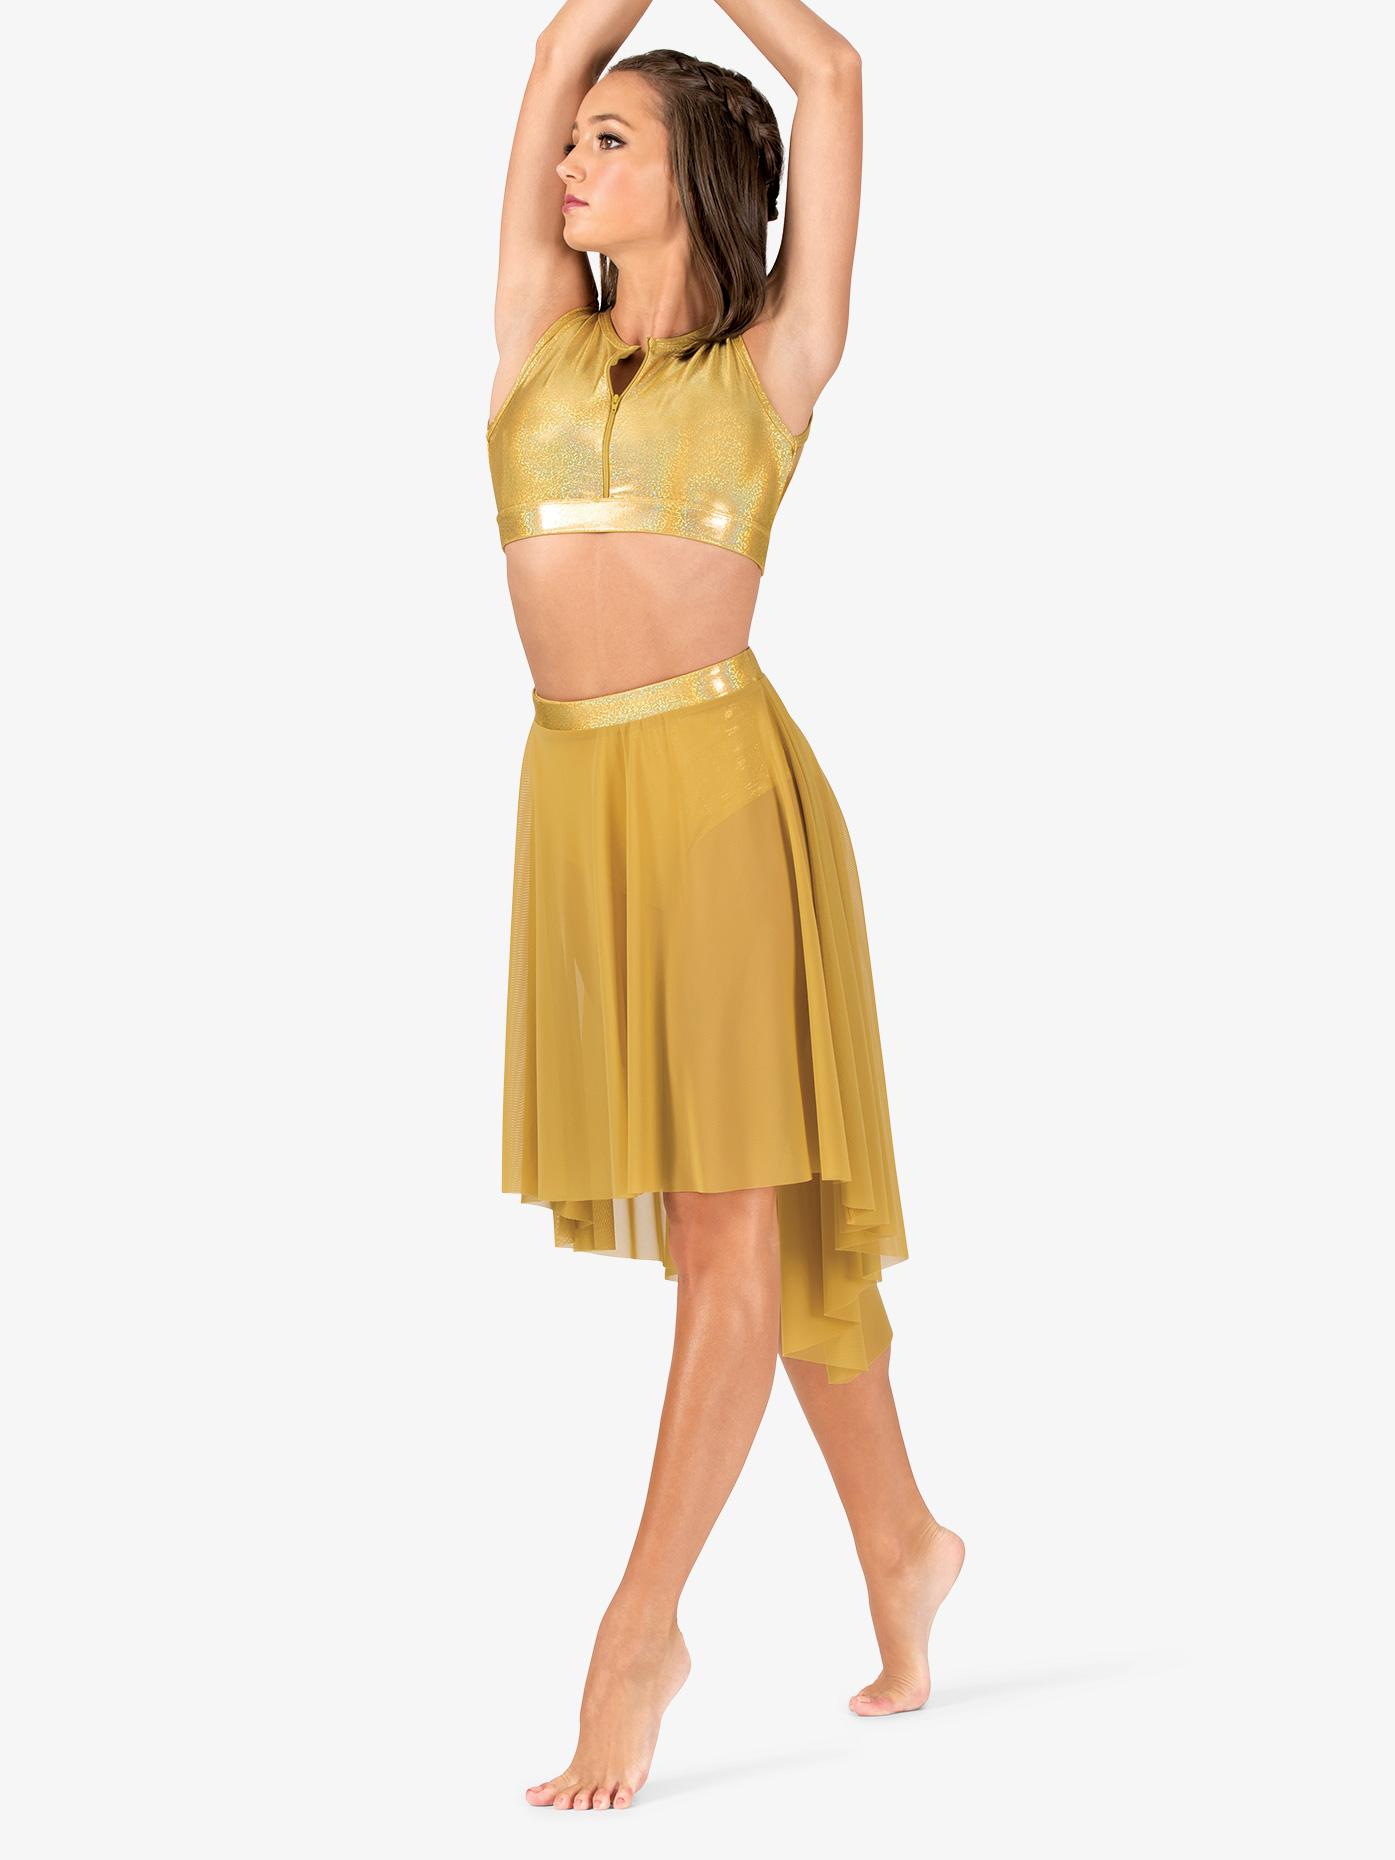 Ingenue Womens Iridescent Mesh Performance High-Low Skirt ING136